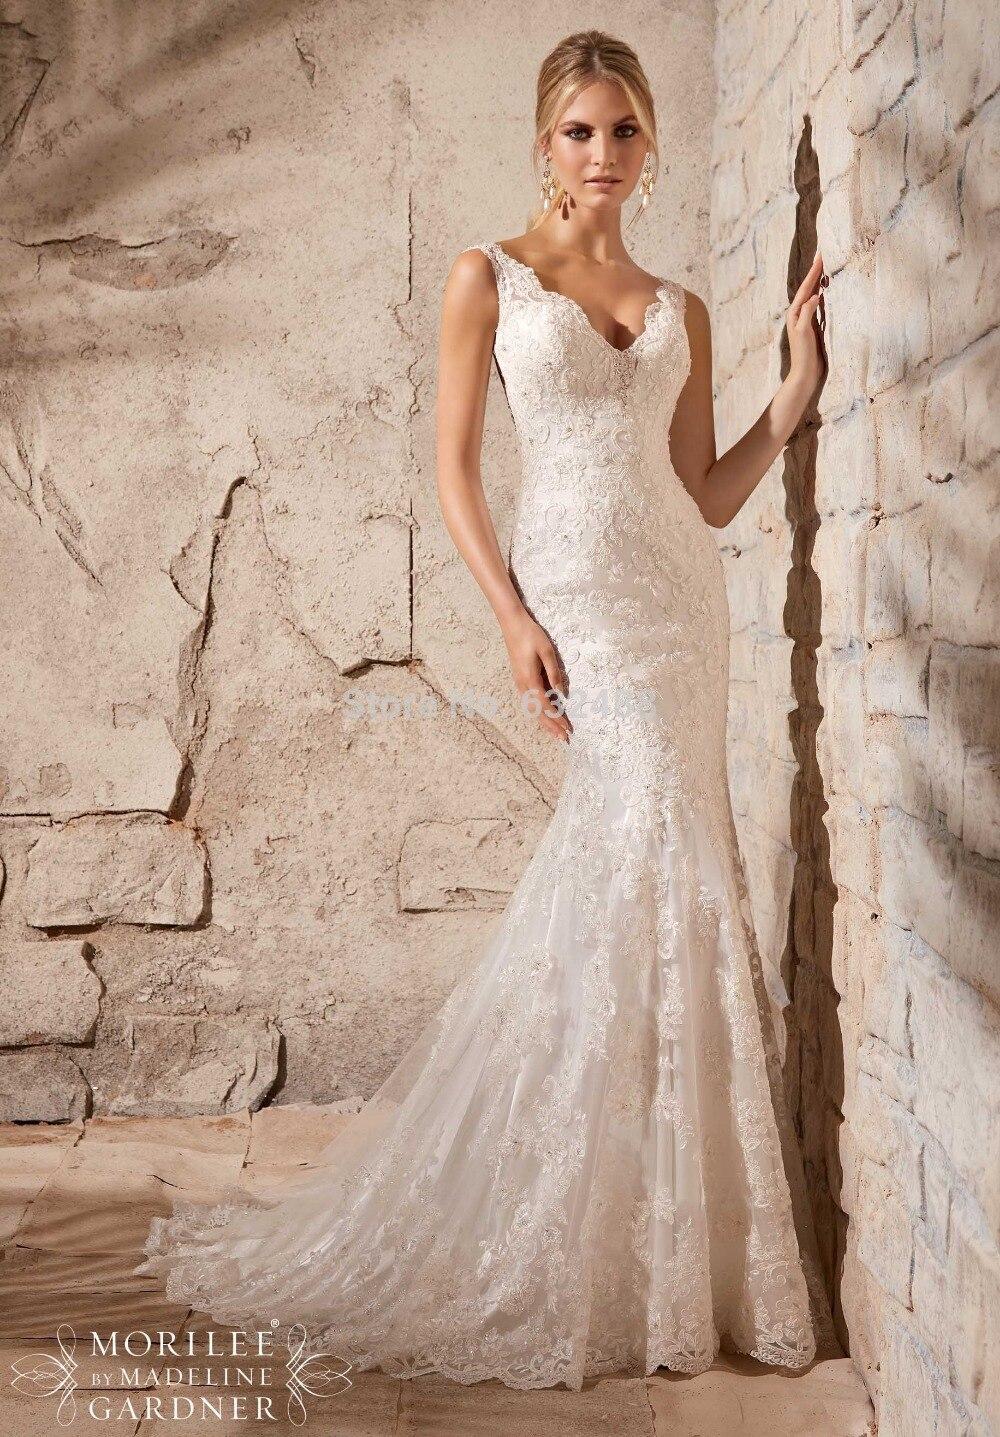 petite wedding dresses wedding dresses for petite Strapless Sheath Mini Bridal Dress with Appliques